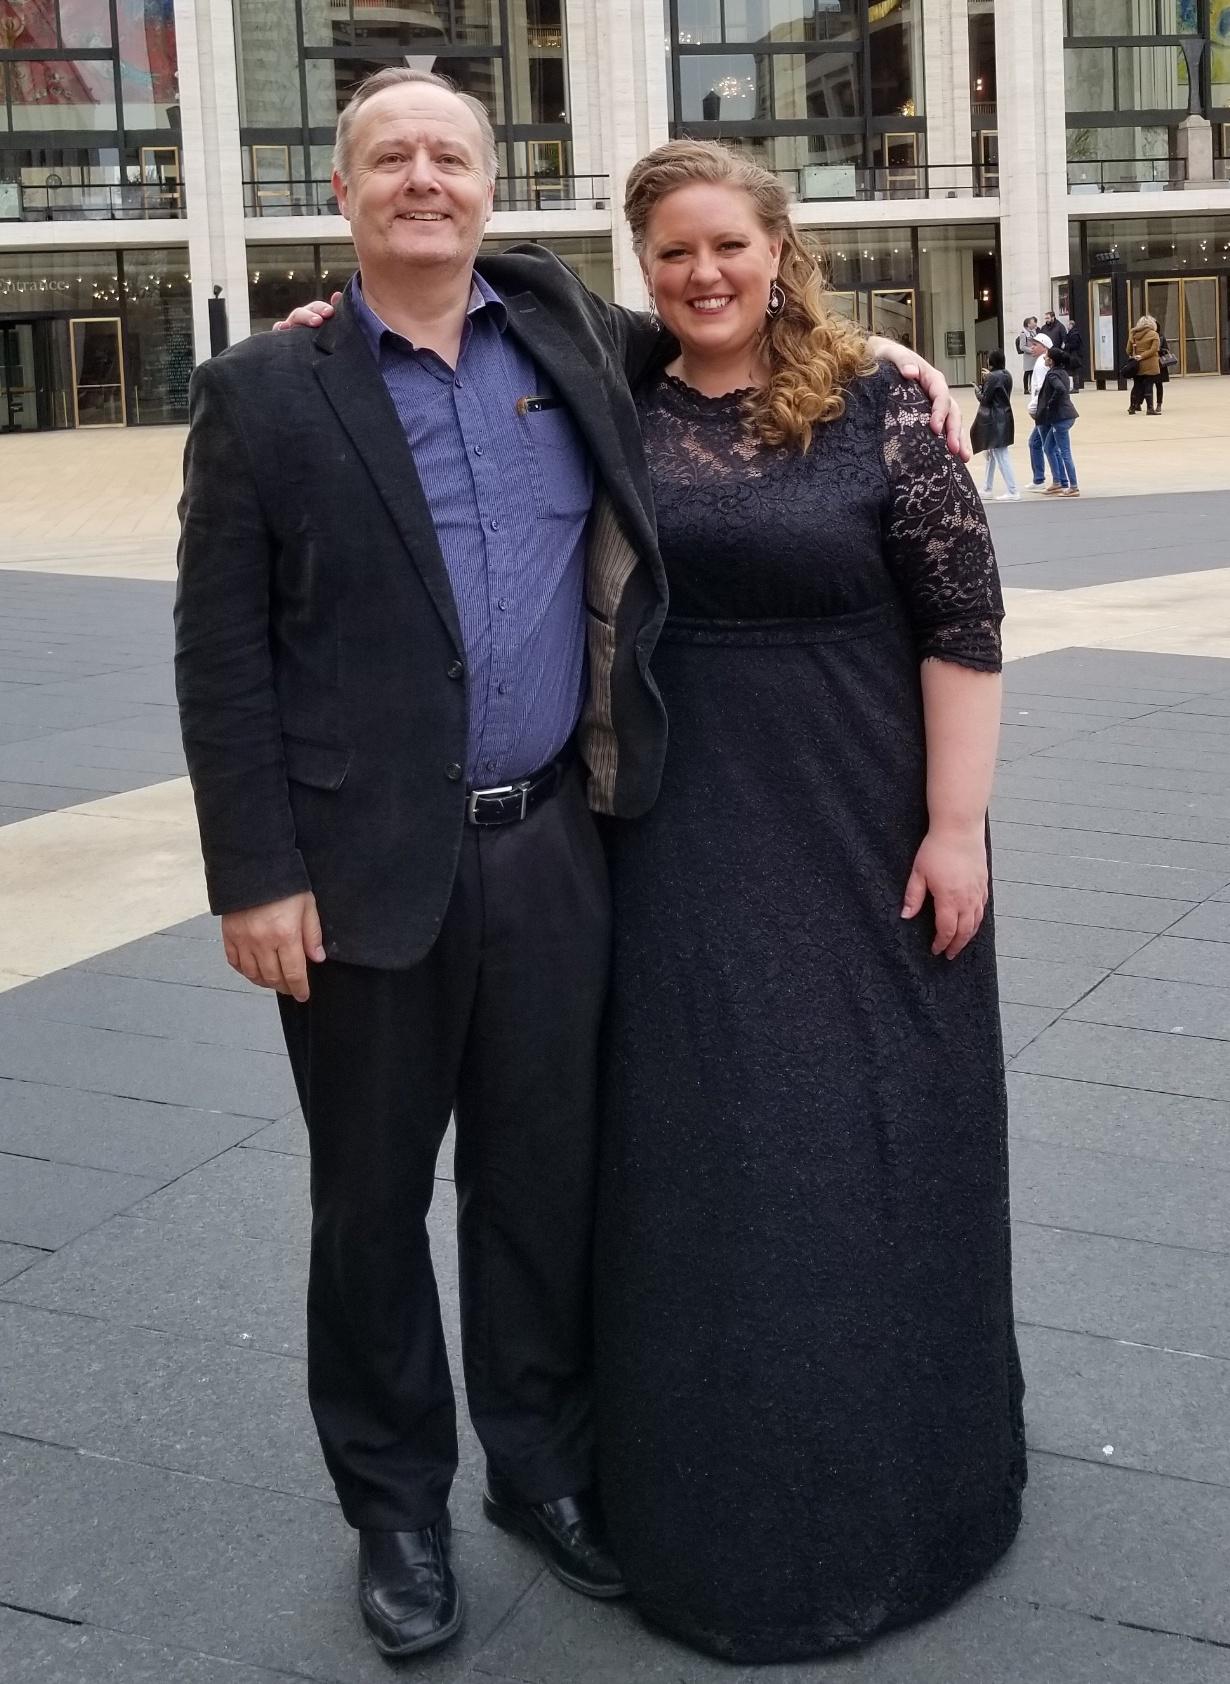 Mary Hoskins and her voice teacher, BYU professor Darrell Babidge, outside New York City's Metropolitan Opera House.